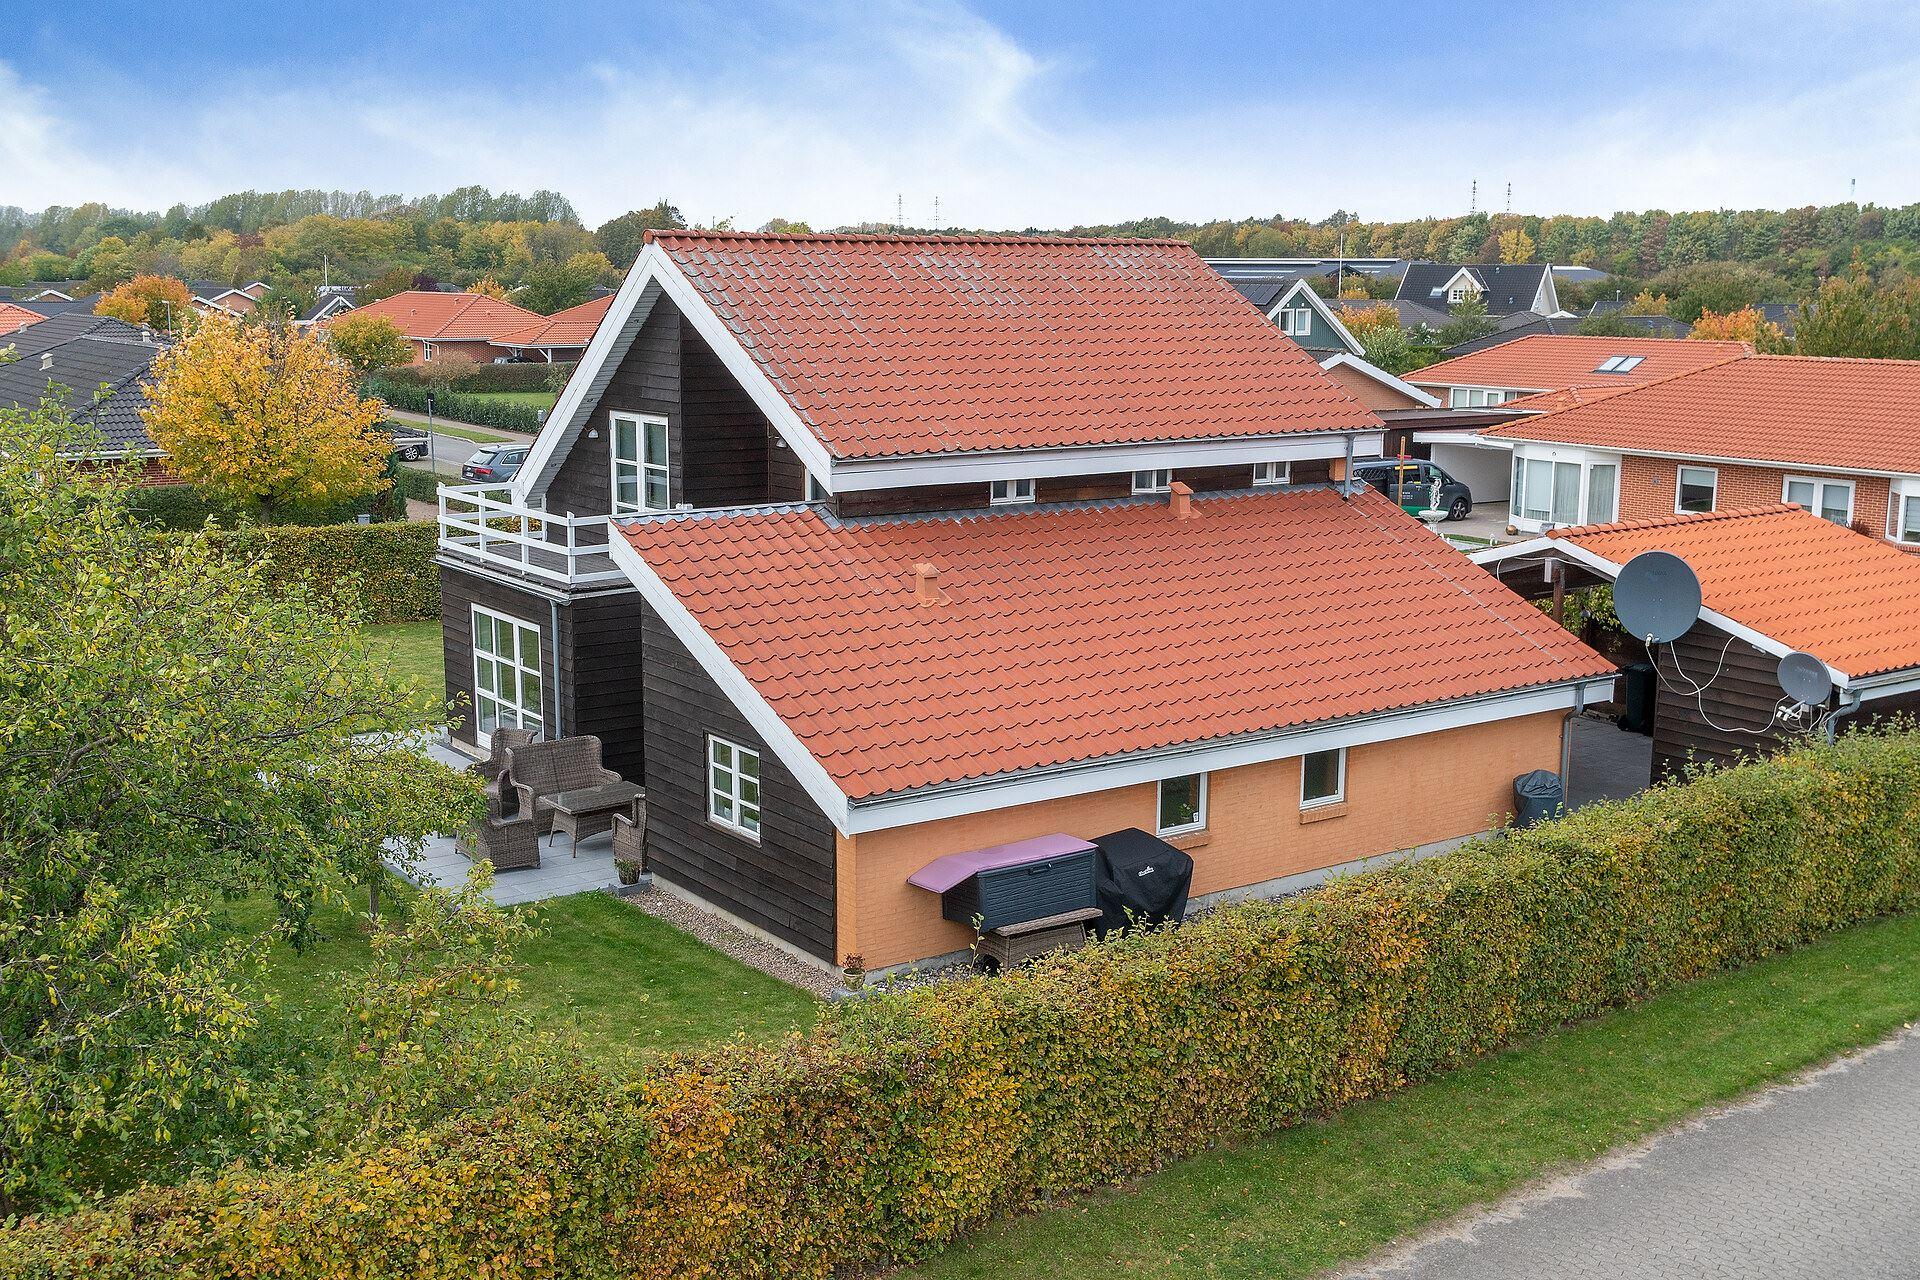 Agerlunden 32, 2660 Brøndby Strand